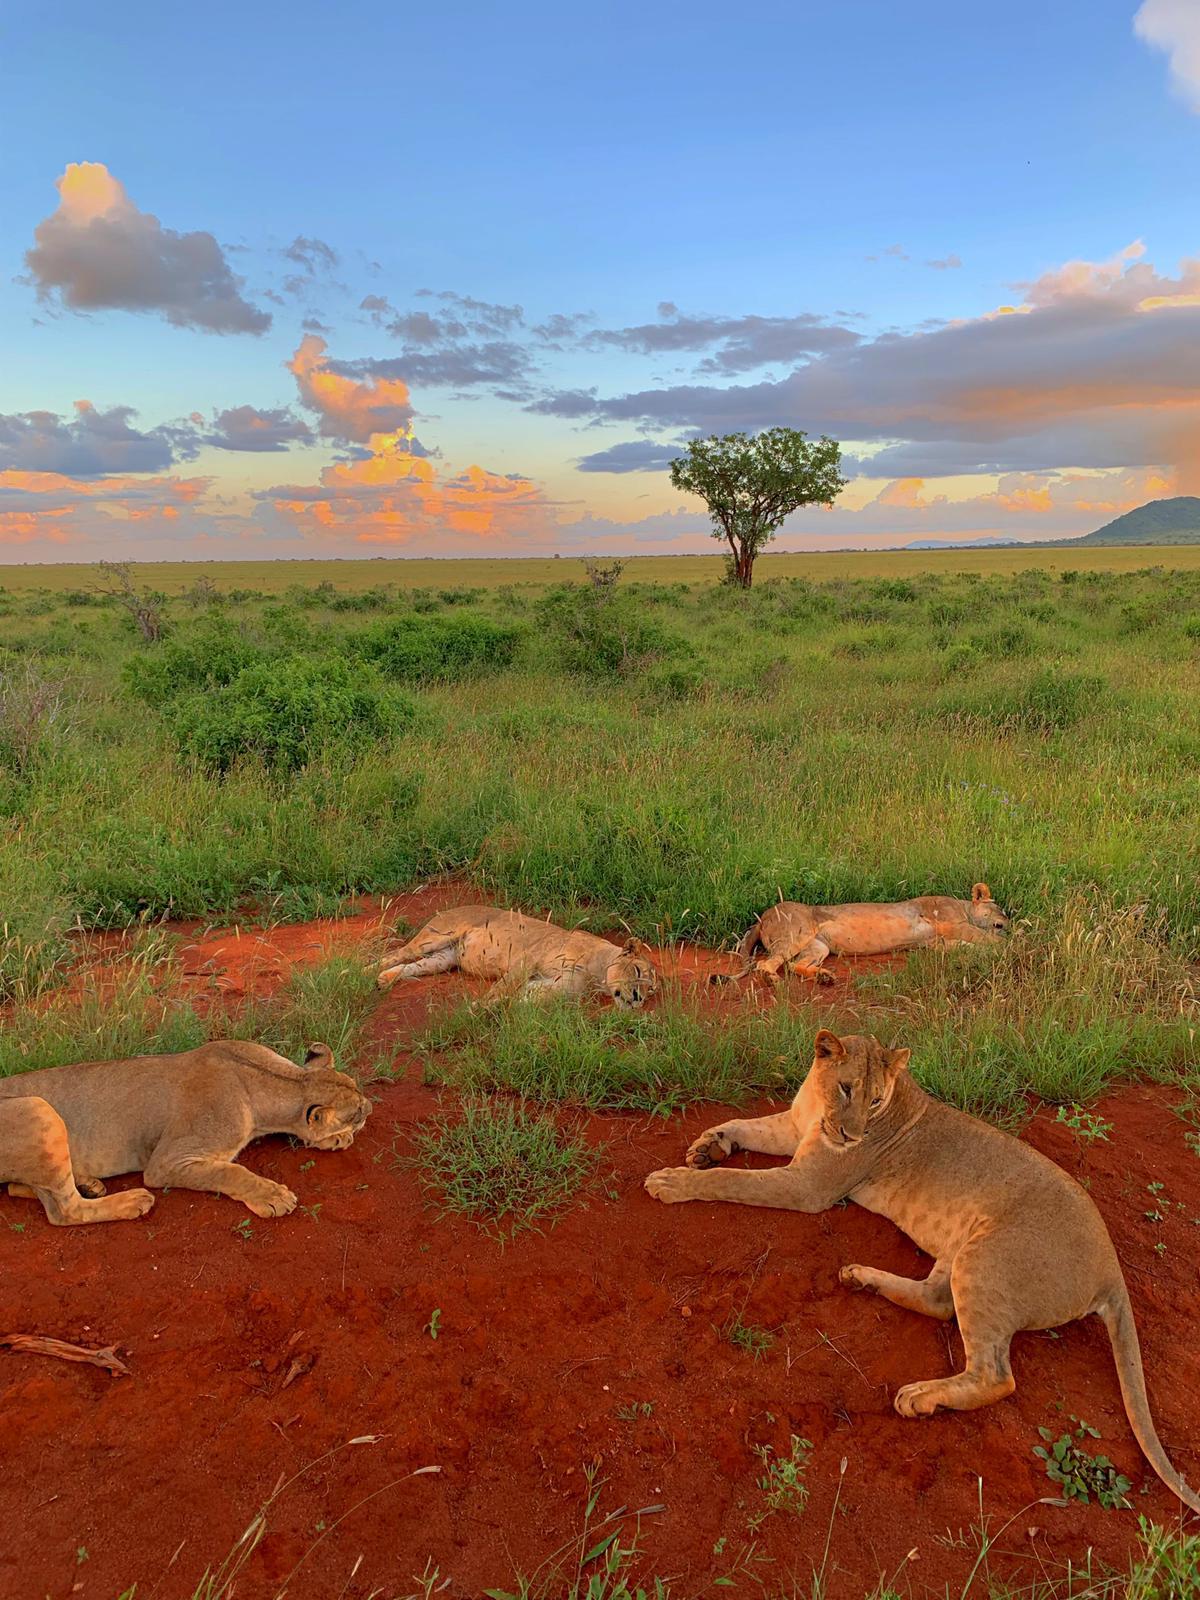 WhatsApp Image 2019 12 16 at 13.45.32 - Safari Masai Mara . Lago Nakuru . Amboseli . Taita Hills . Tsavo Est